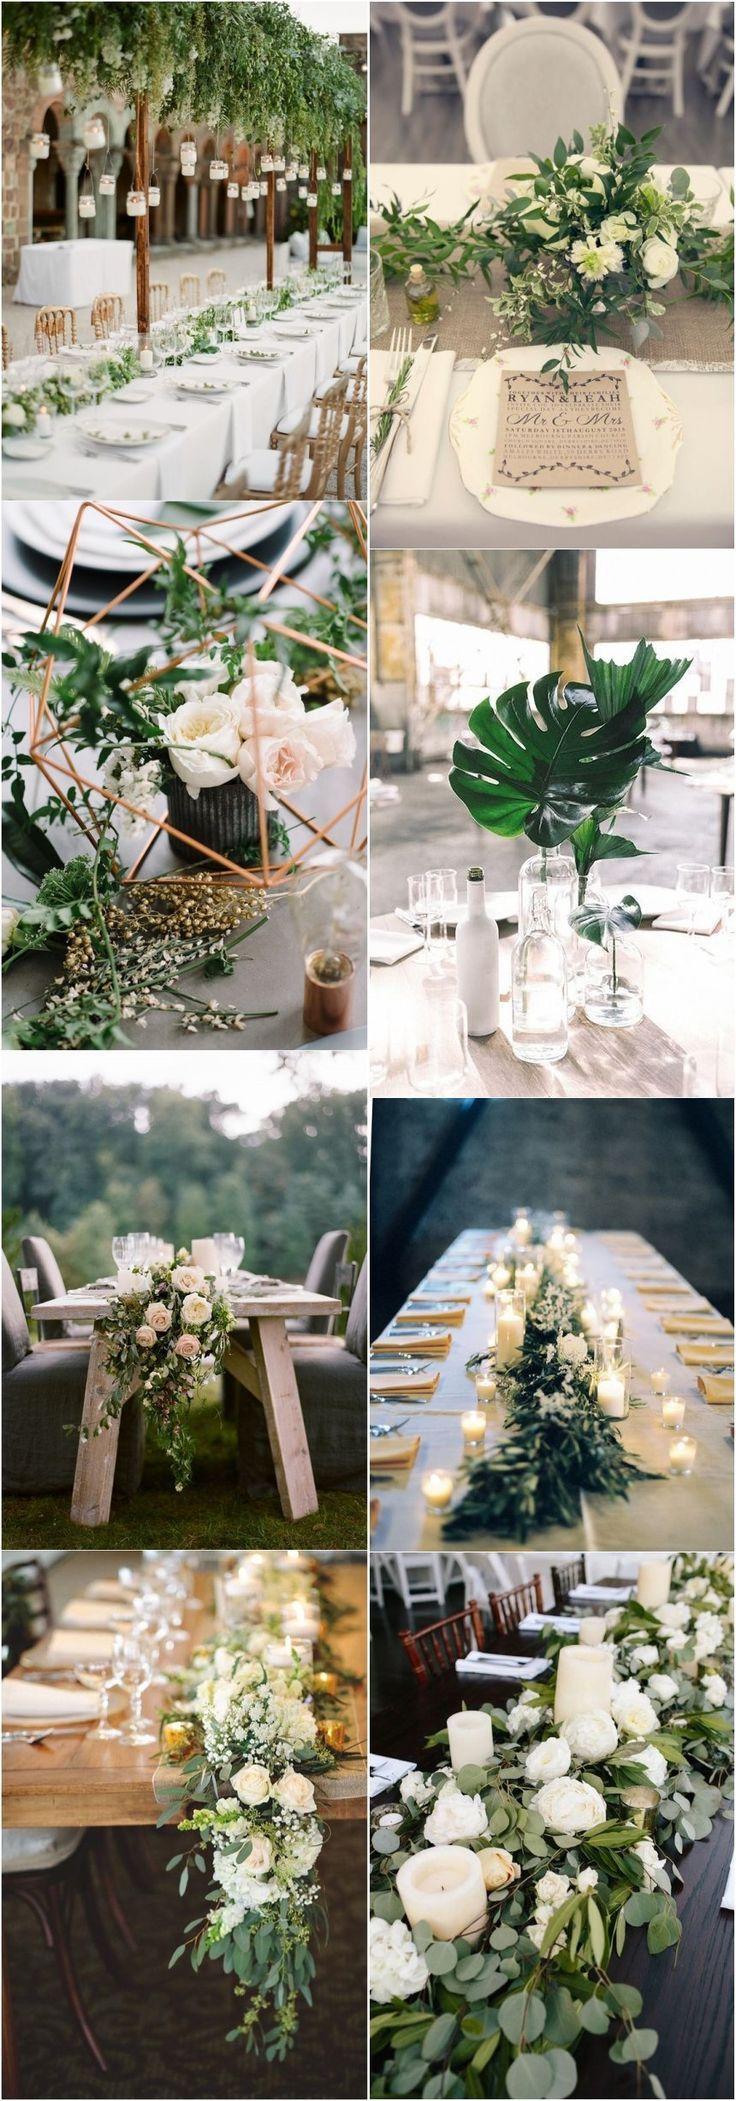 Wedding Ideas » COLOR OF THE YEAR 2017 – Greenery Wedding Centerpiece Ideas ❤️ See more: www.weddinginclud...